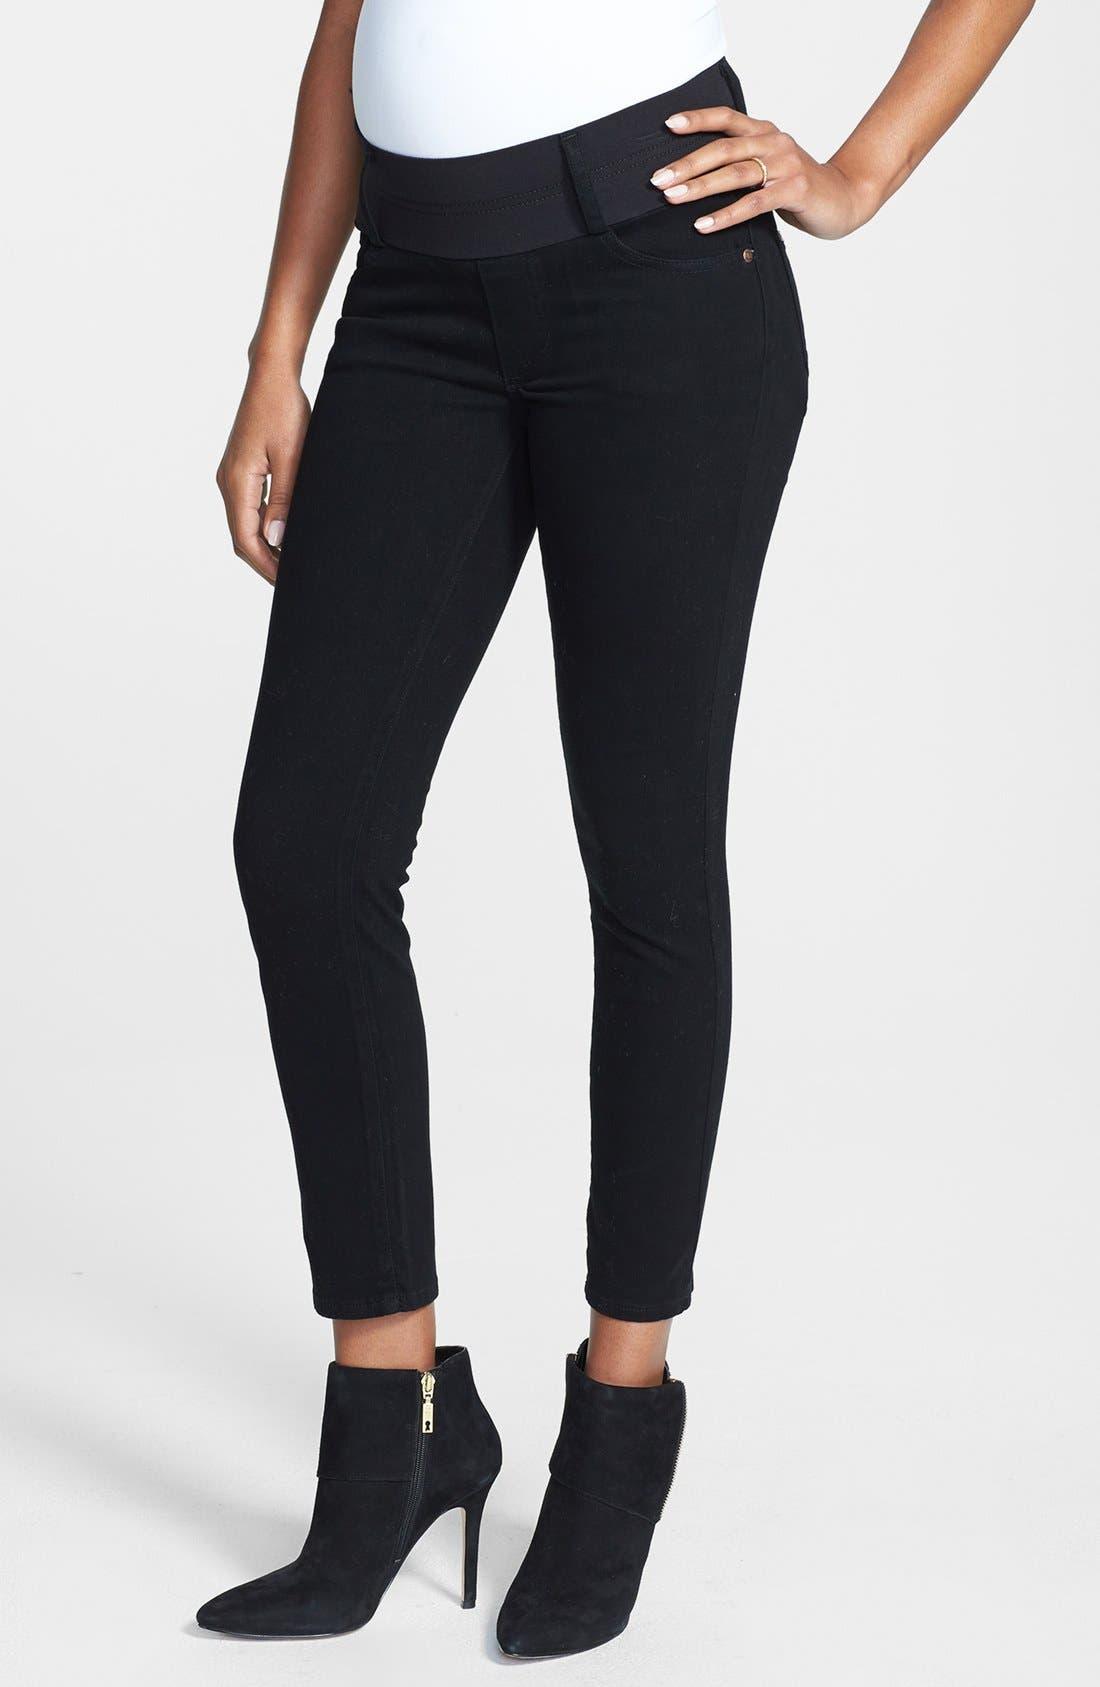 MATERNAL AMERICA Maternity Skinny Ankle Stretch Jeans, Main, color, BLACK